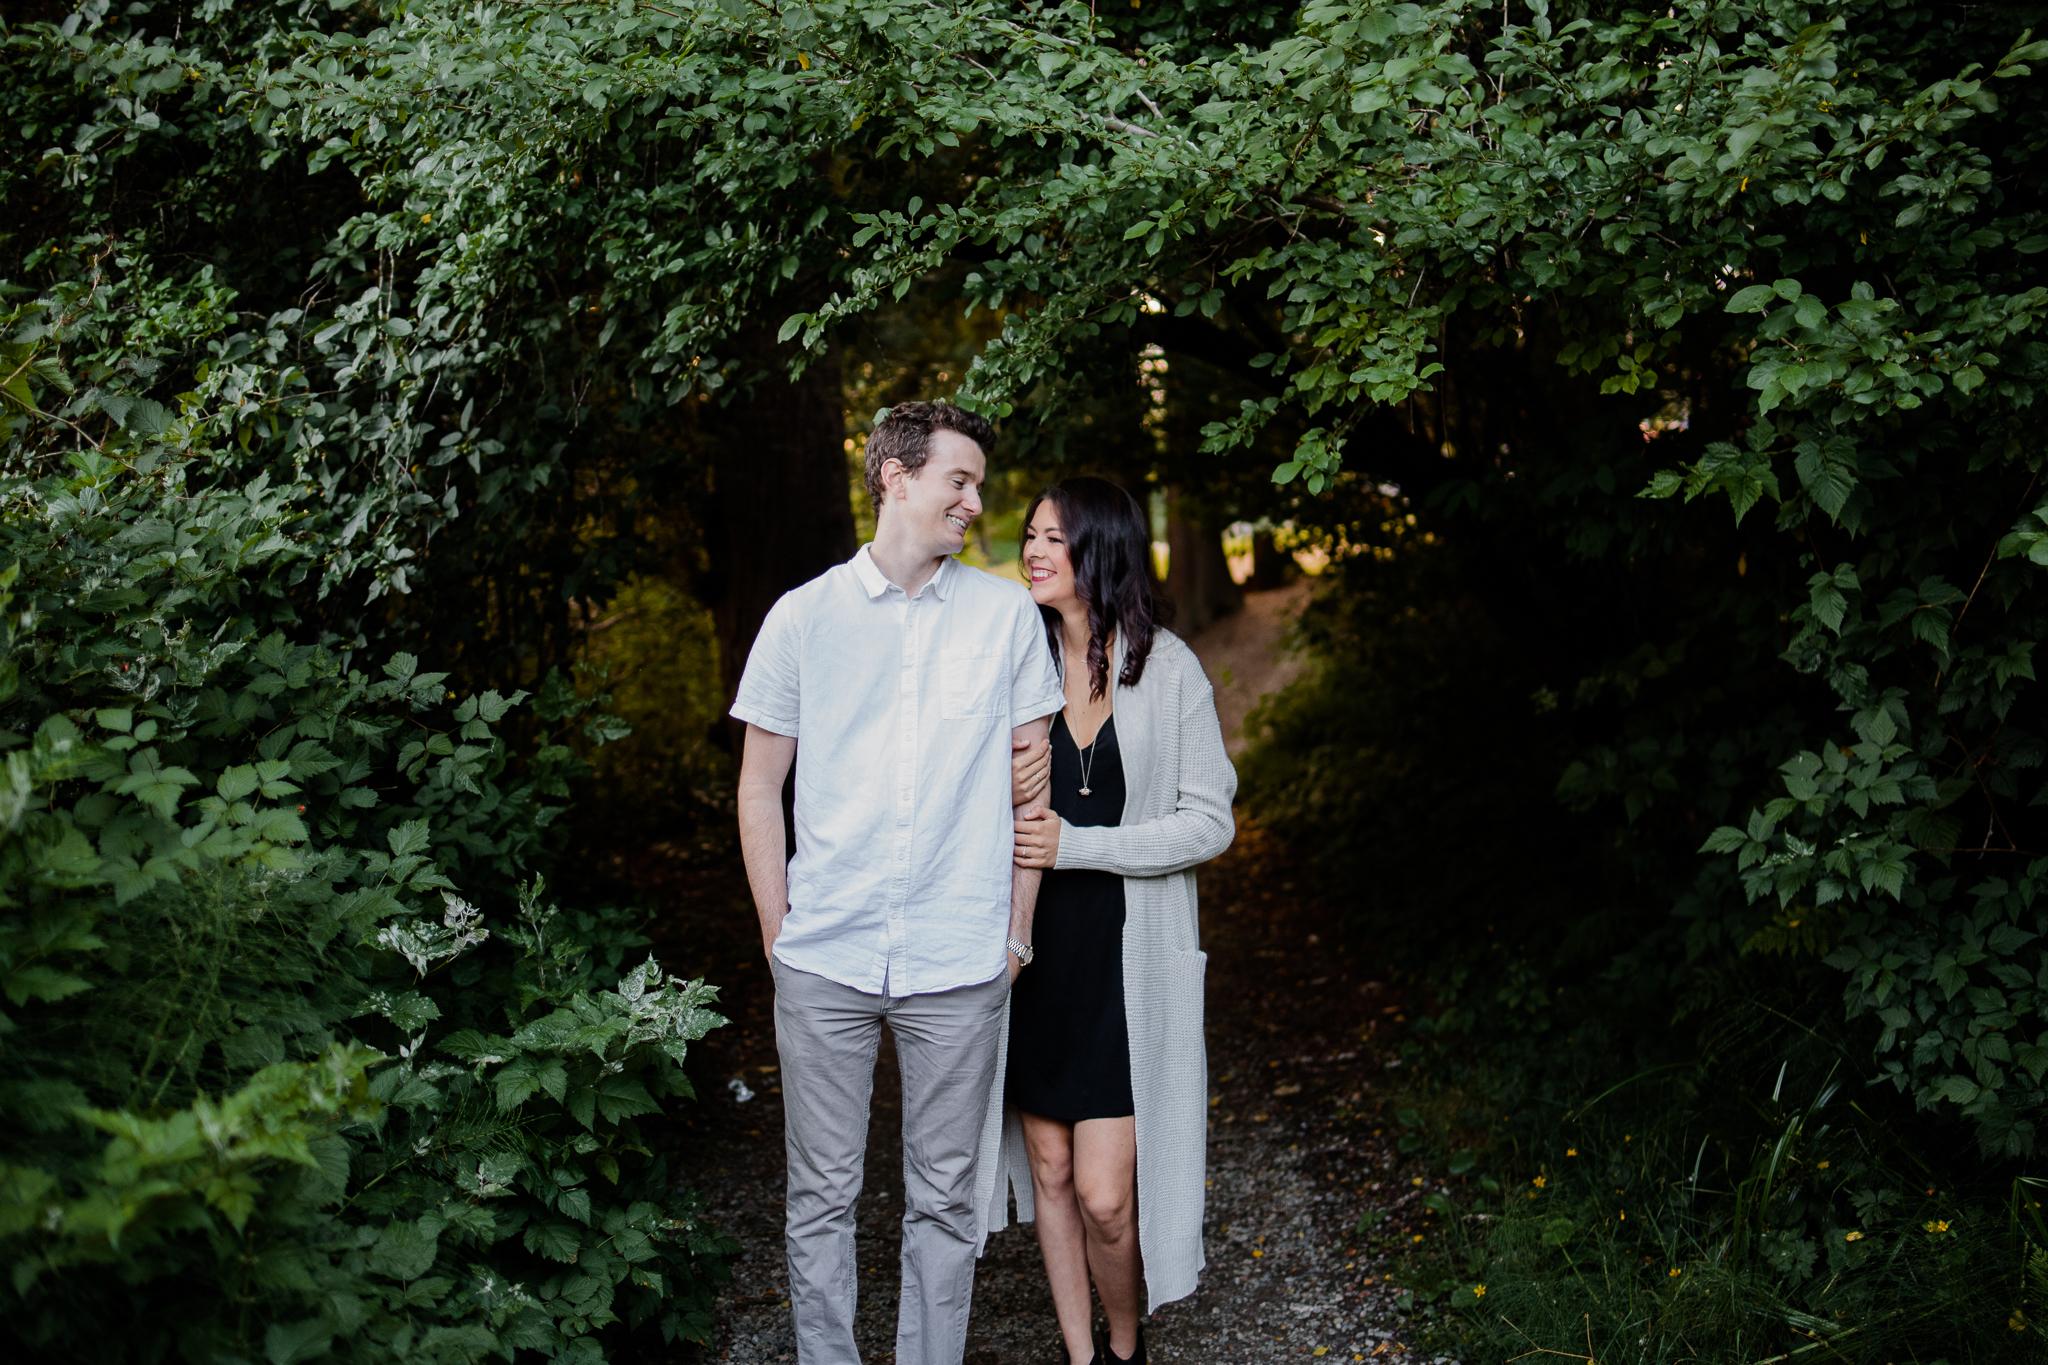 Photo of Buntzen Lake Anmore British Columbia Landscape Best Fun Engagement Photographer Port Moody Wedding Sunset Romantic Couple Photos 117.jpg